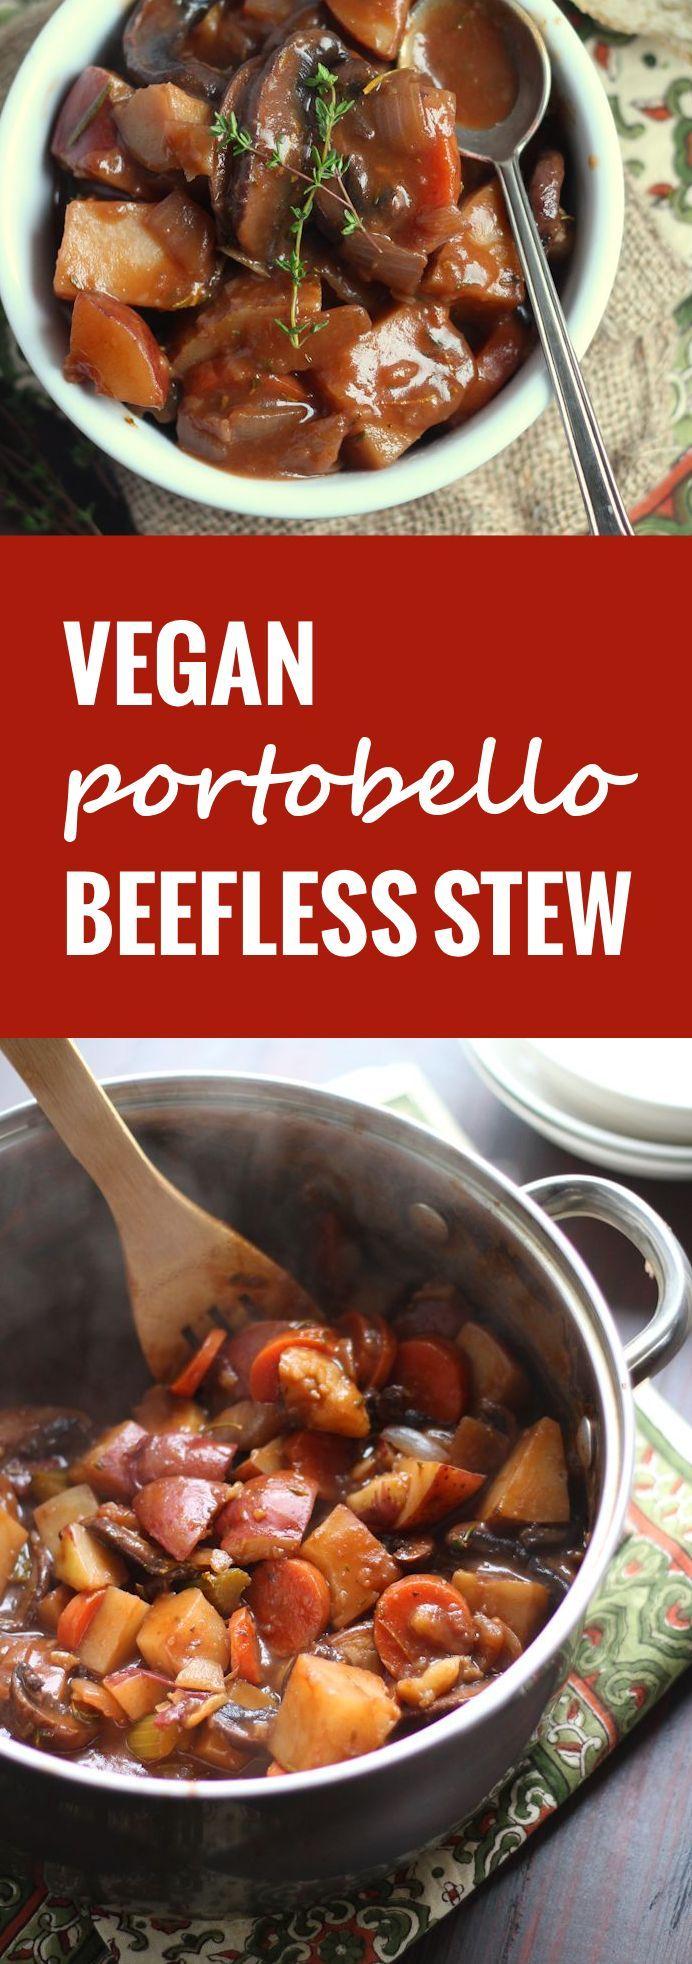 Portobello Vegan Beef(less) Stew                                                                                                                                                      More